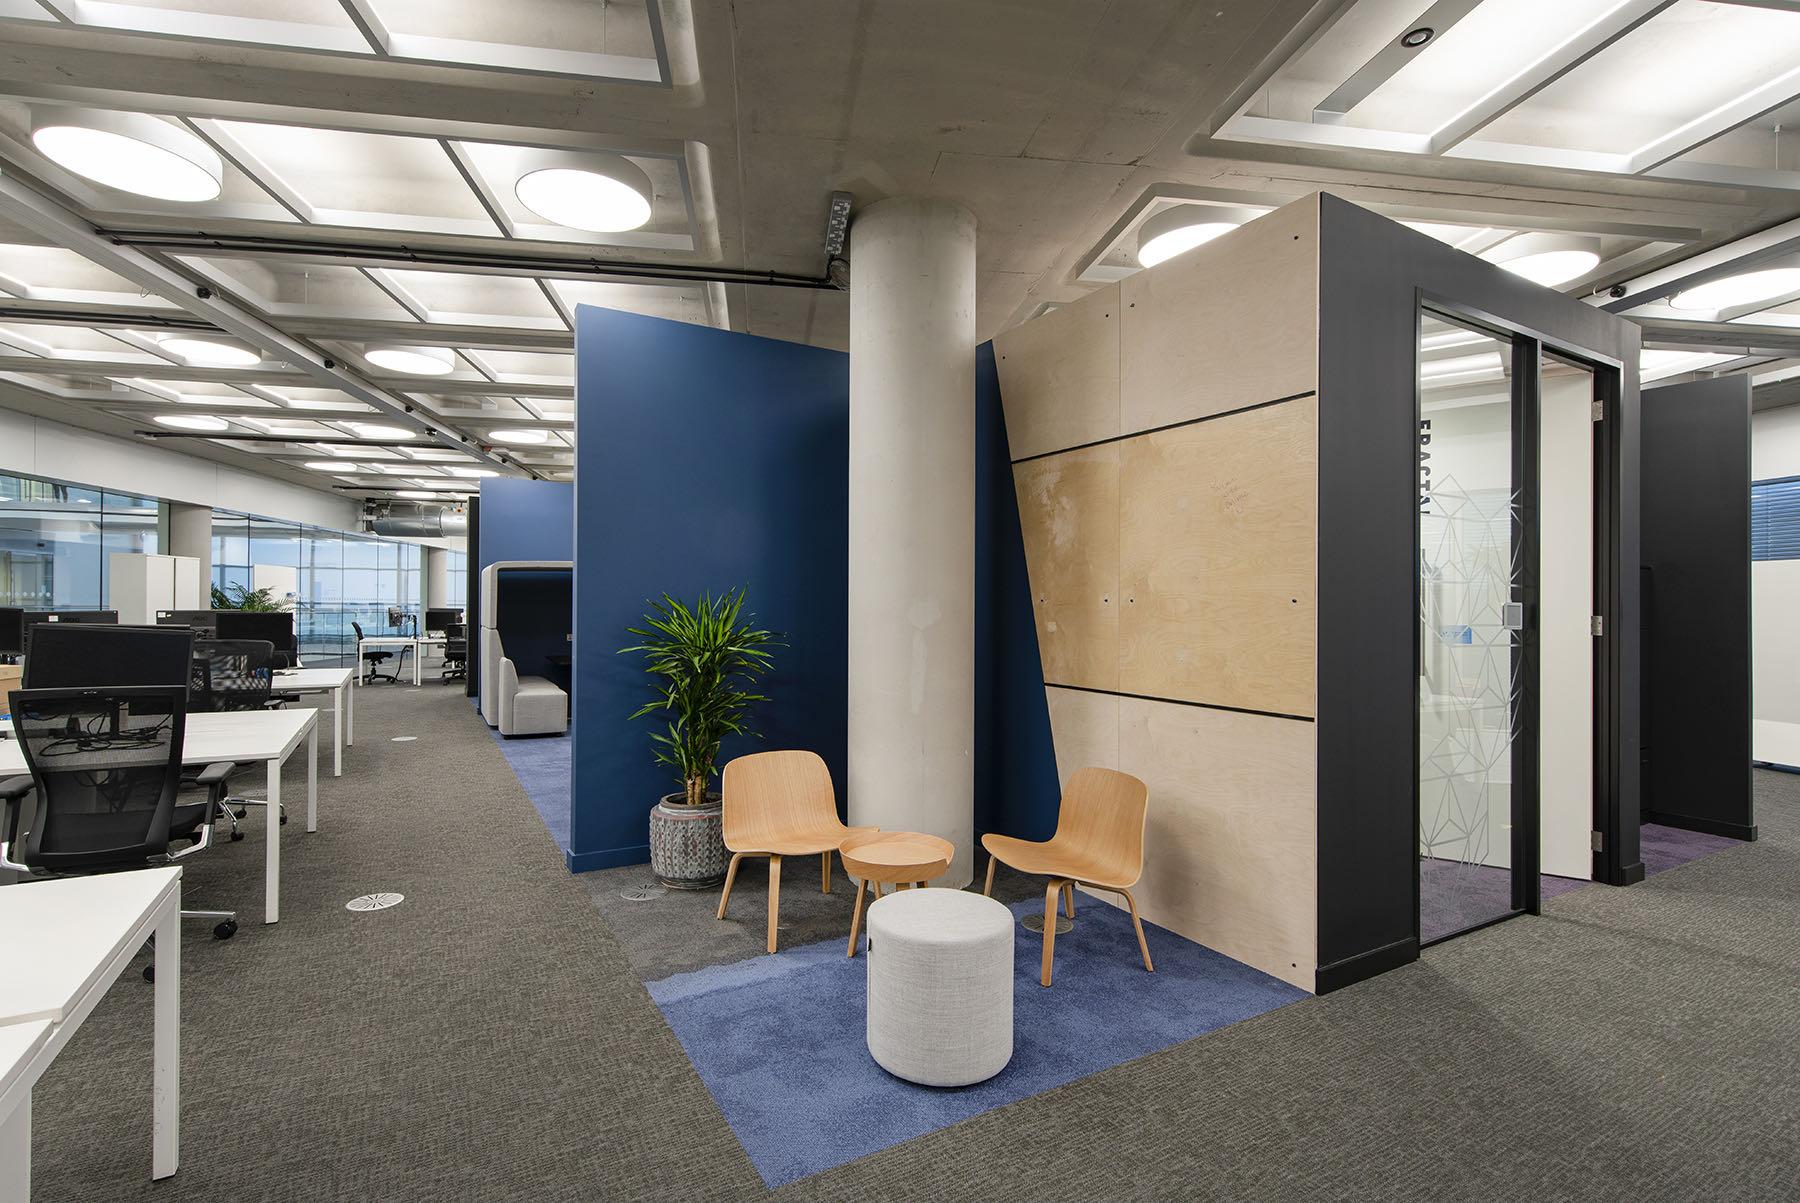 metapack-london-office-13